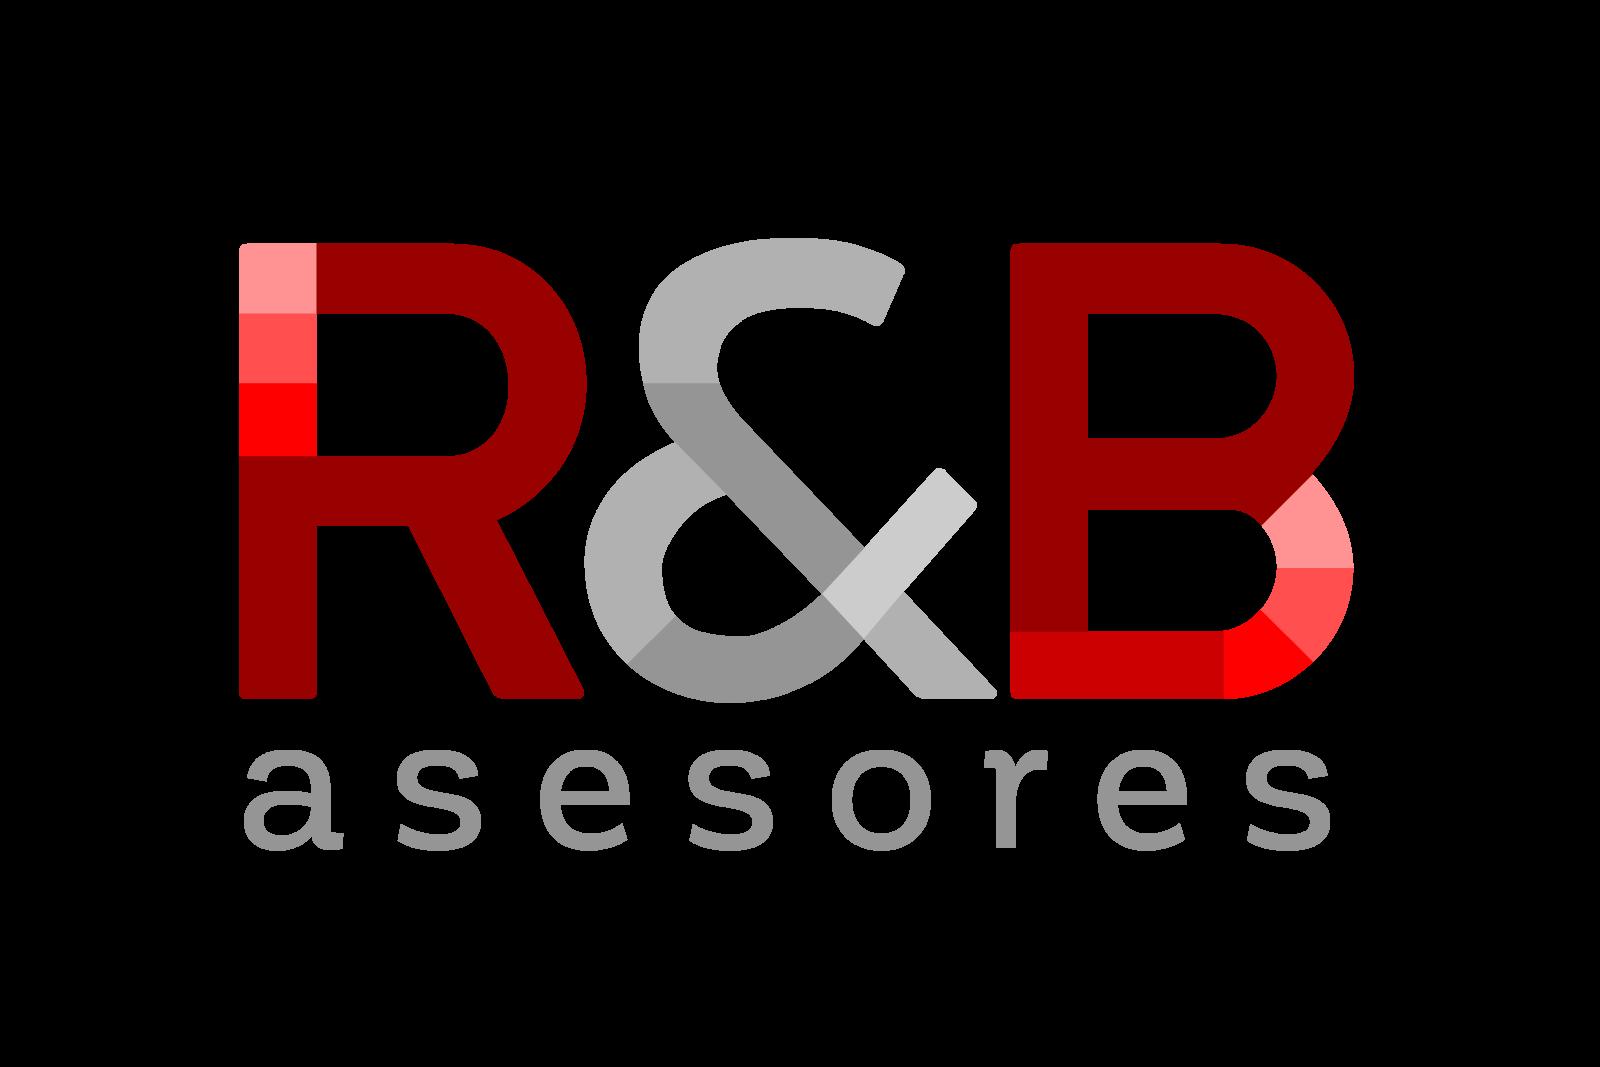 R&B ASESORES